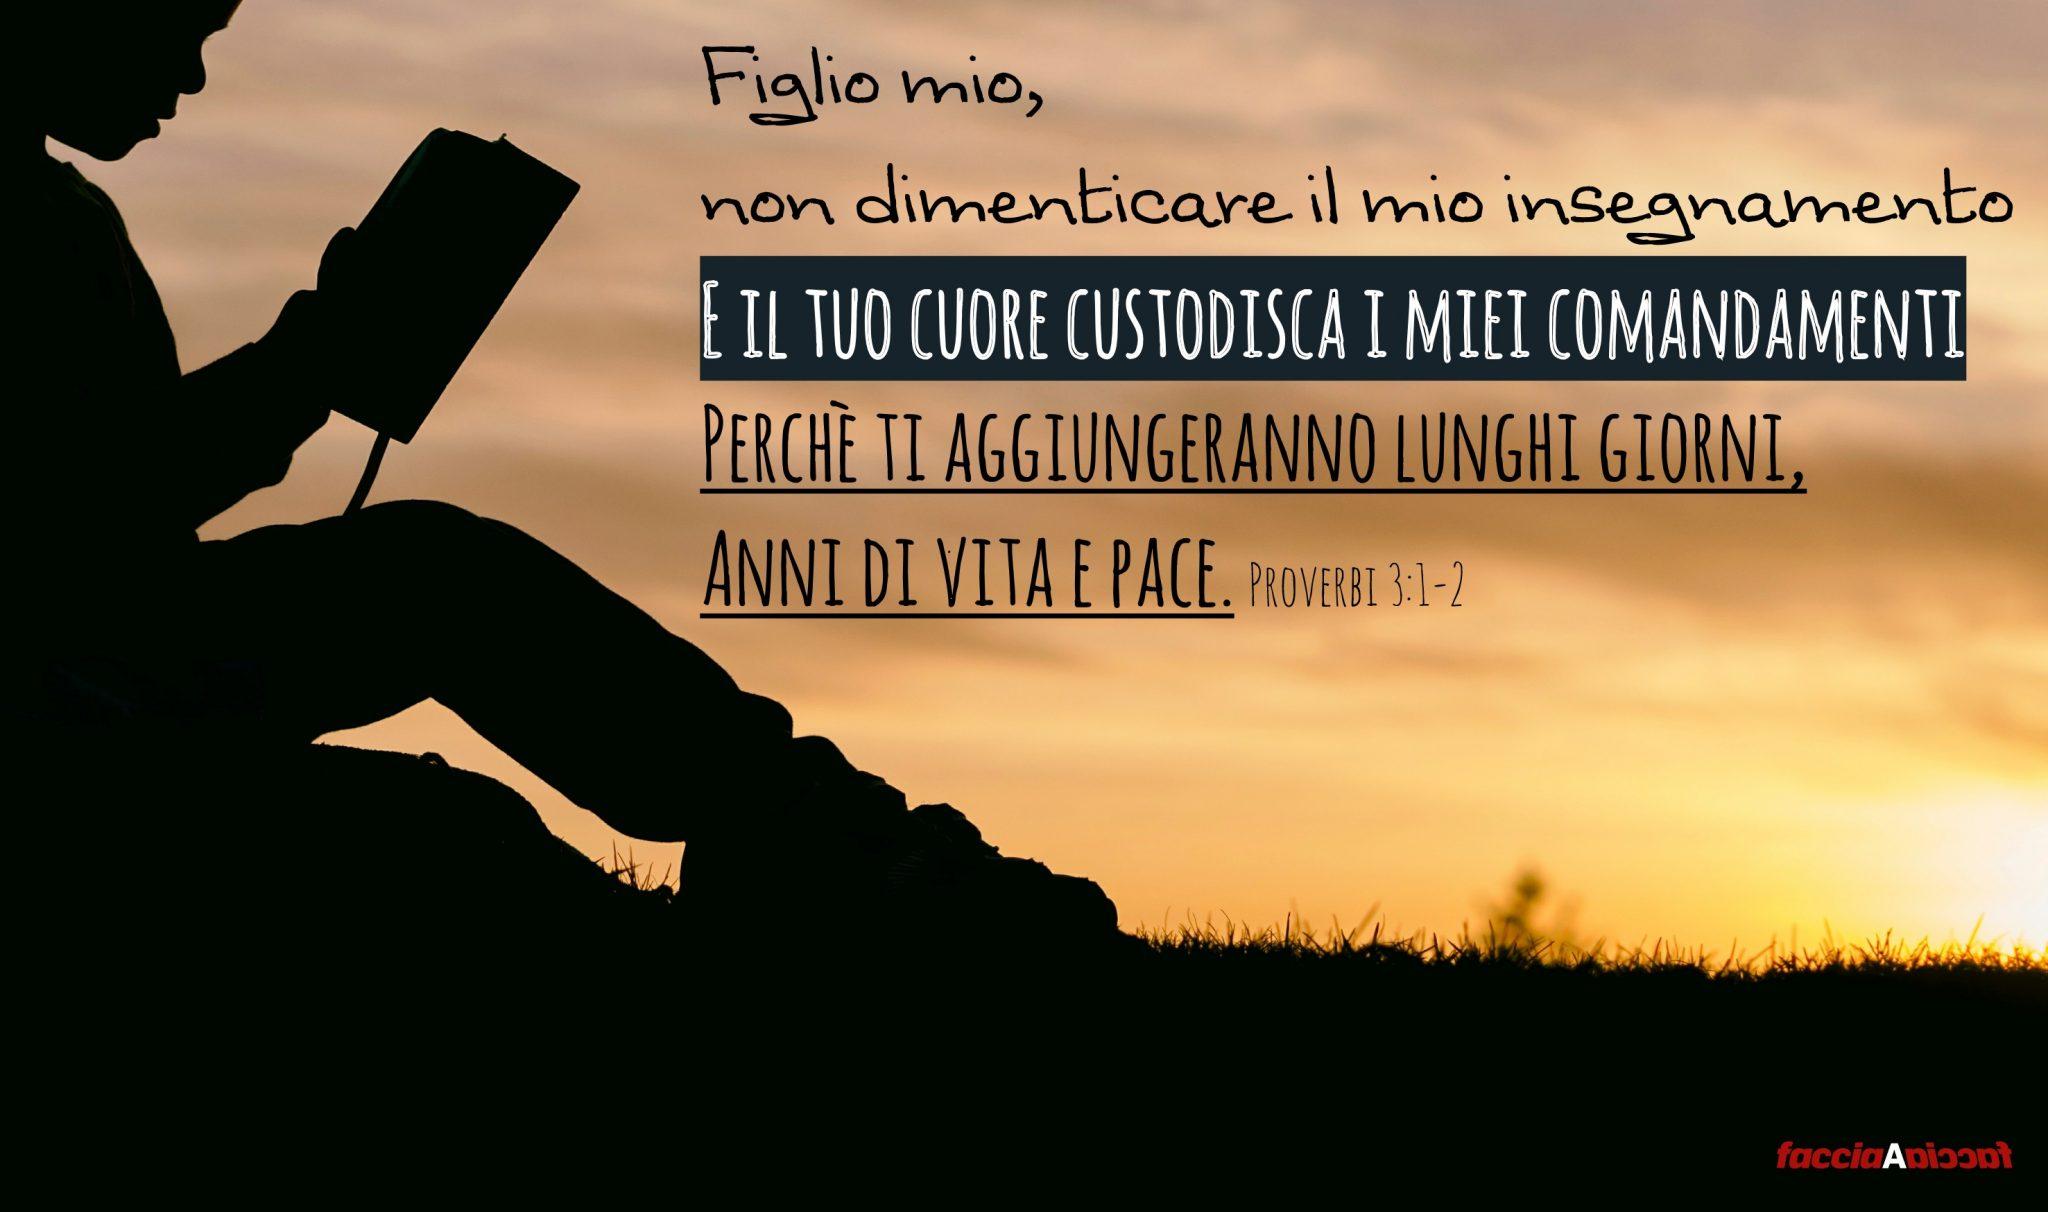 proverbi 3-1-2f